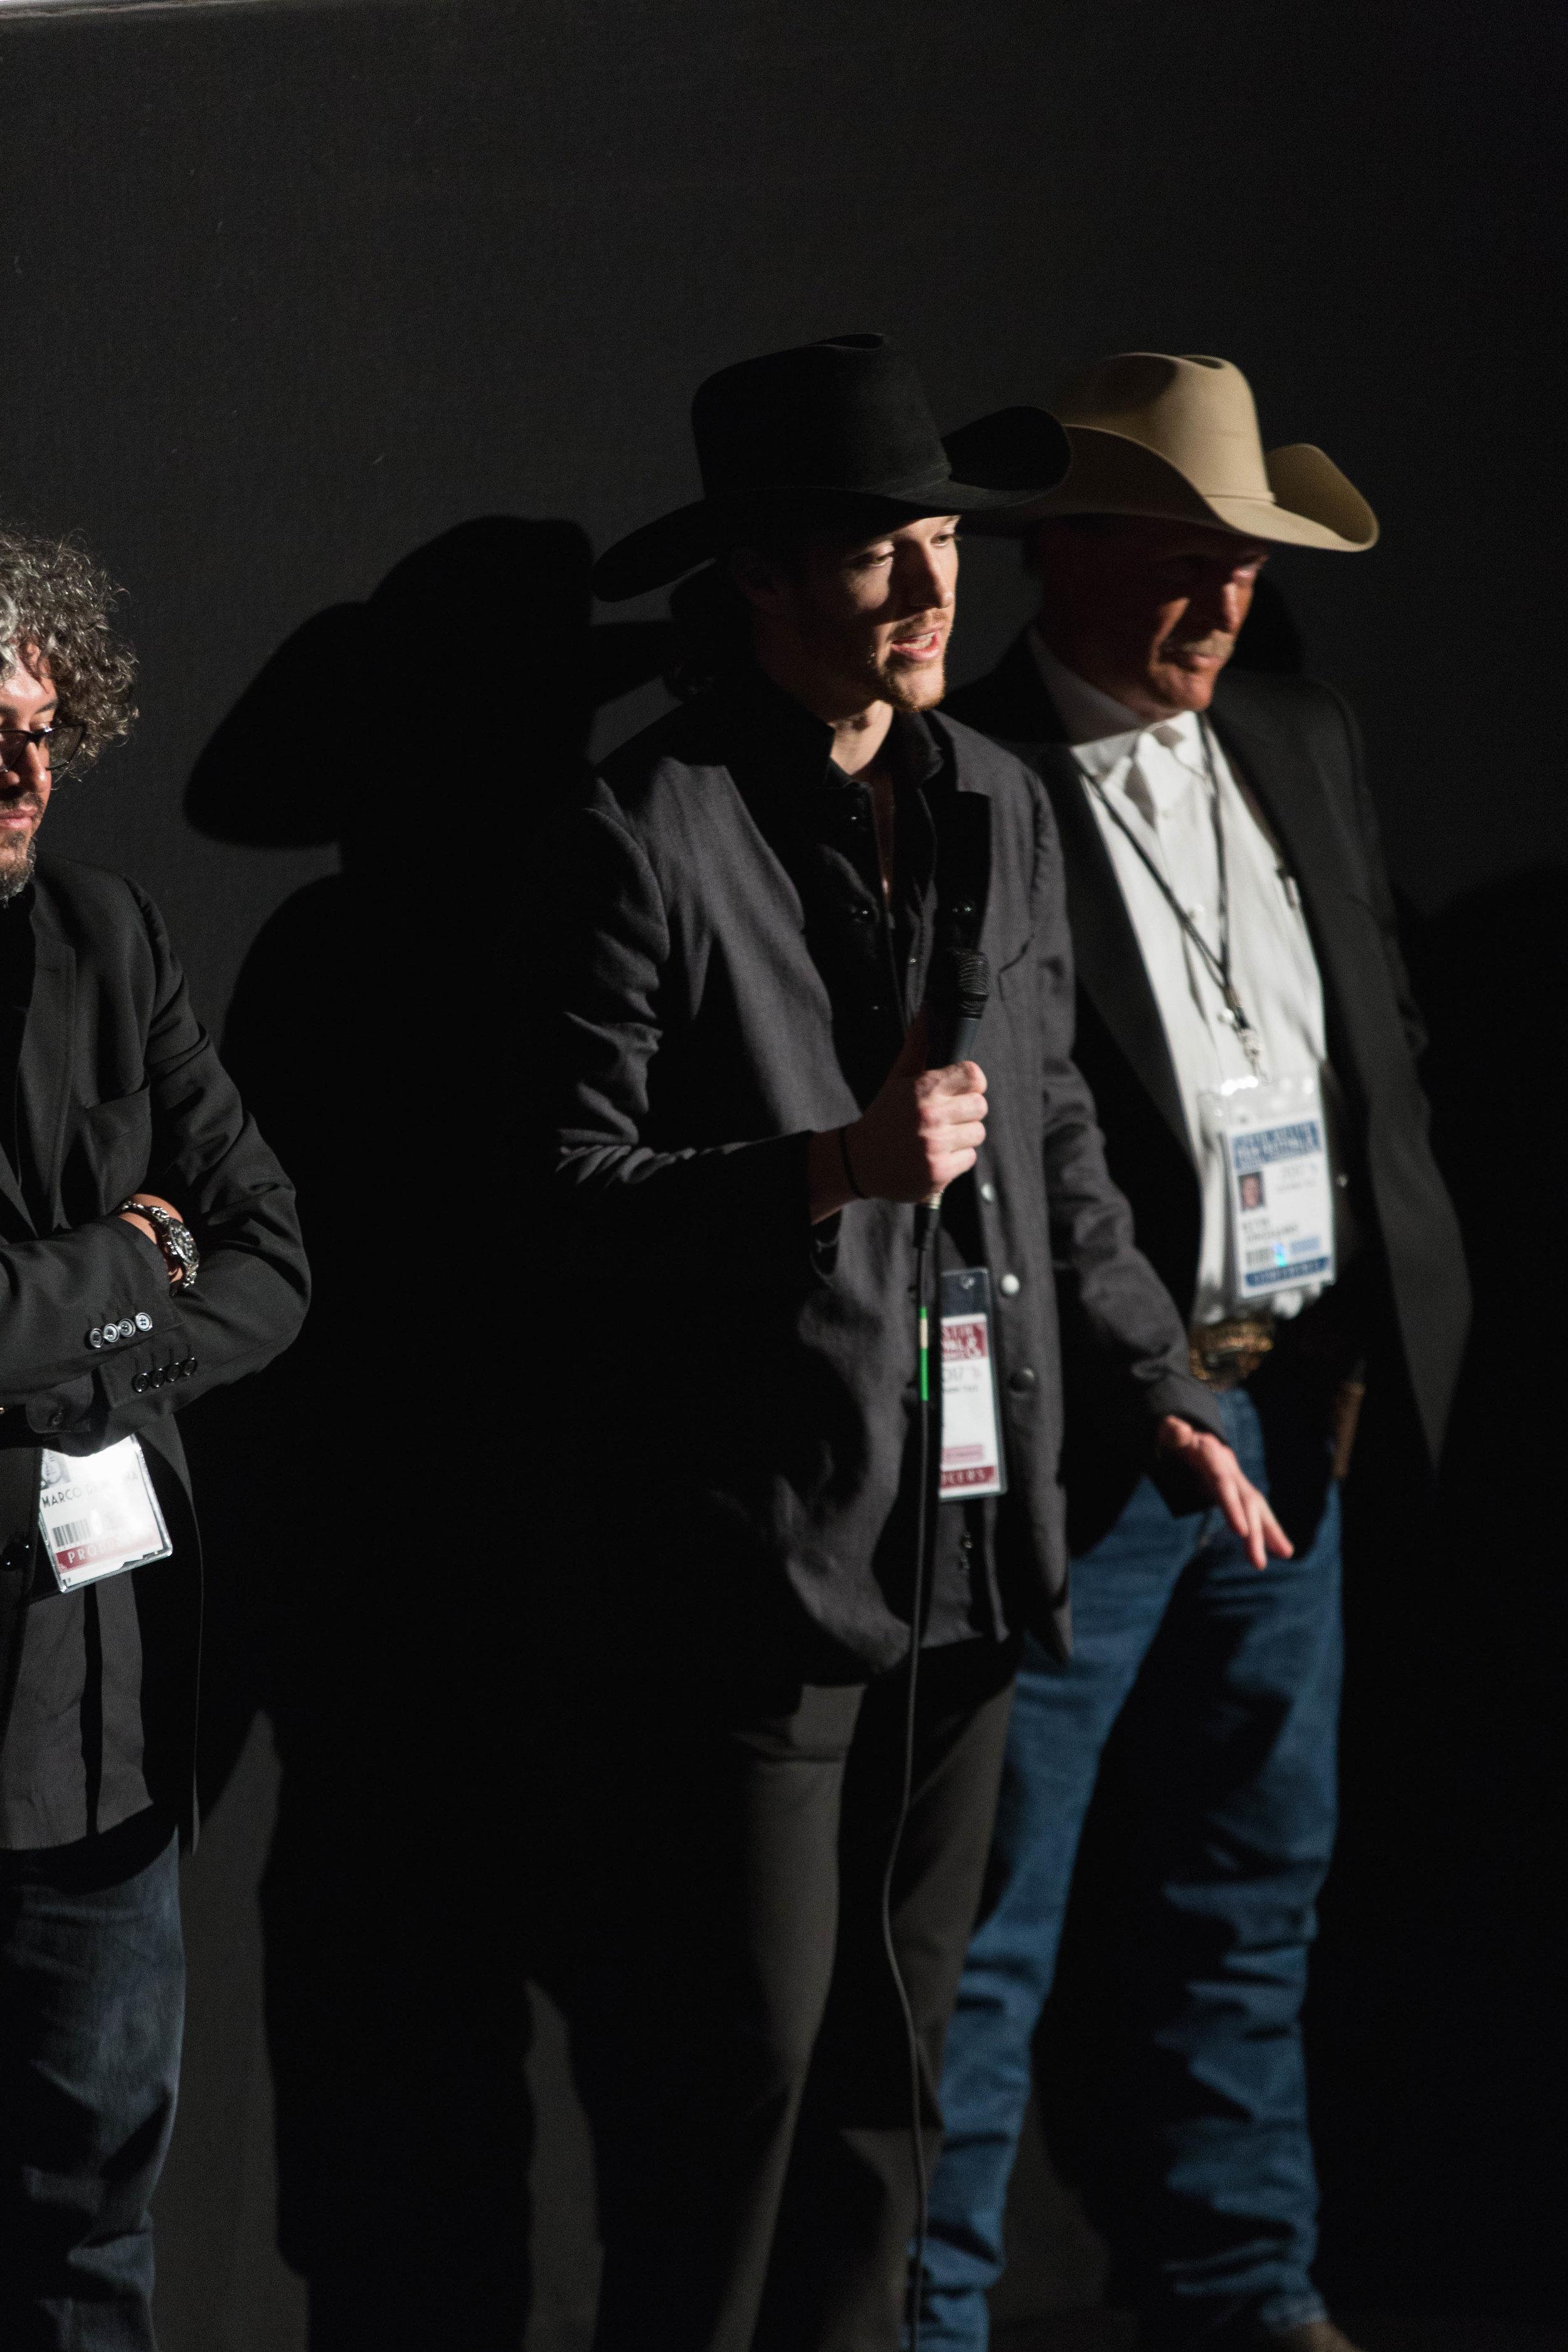 Southern-Tale-Austin-Film-Fest-Kirby-Gladstein-2017-3267.jpg